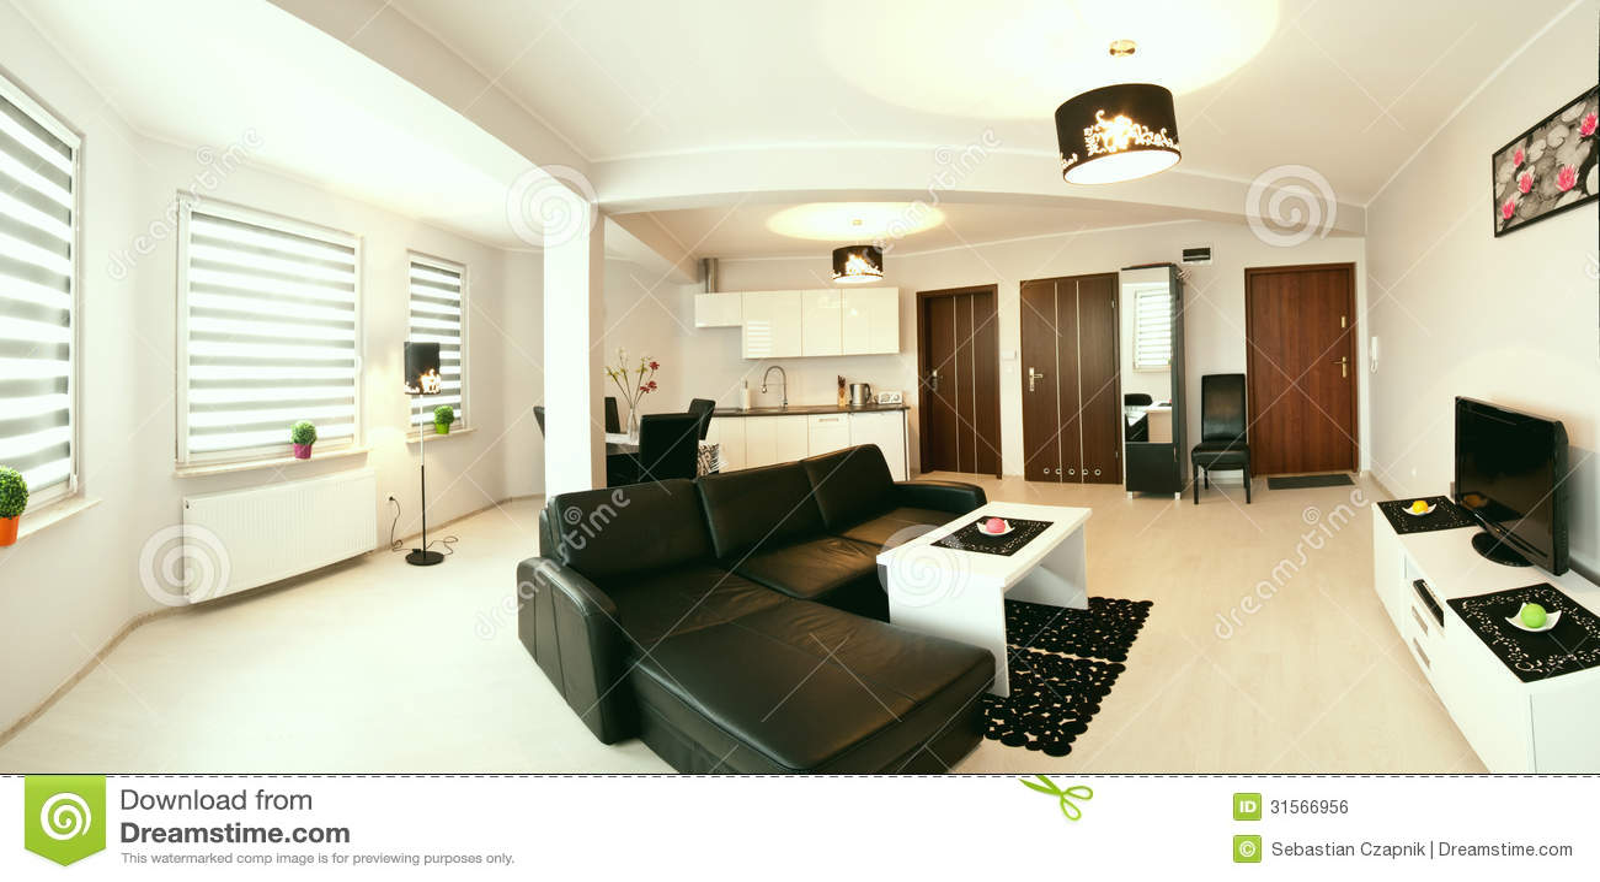 modern living room royalty free stock image image 31566956